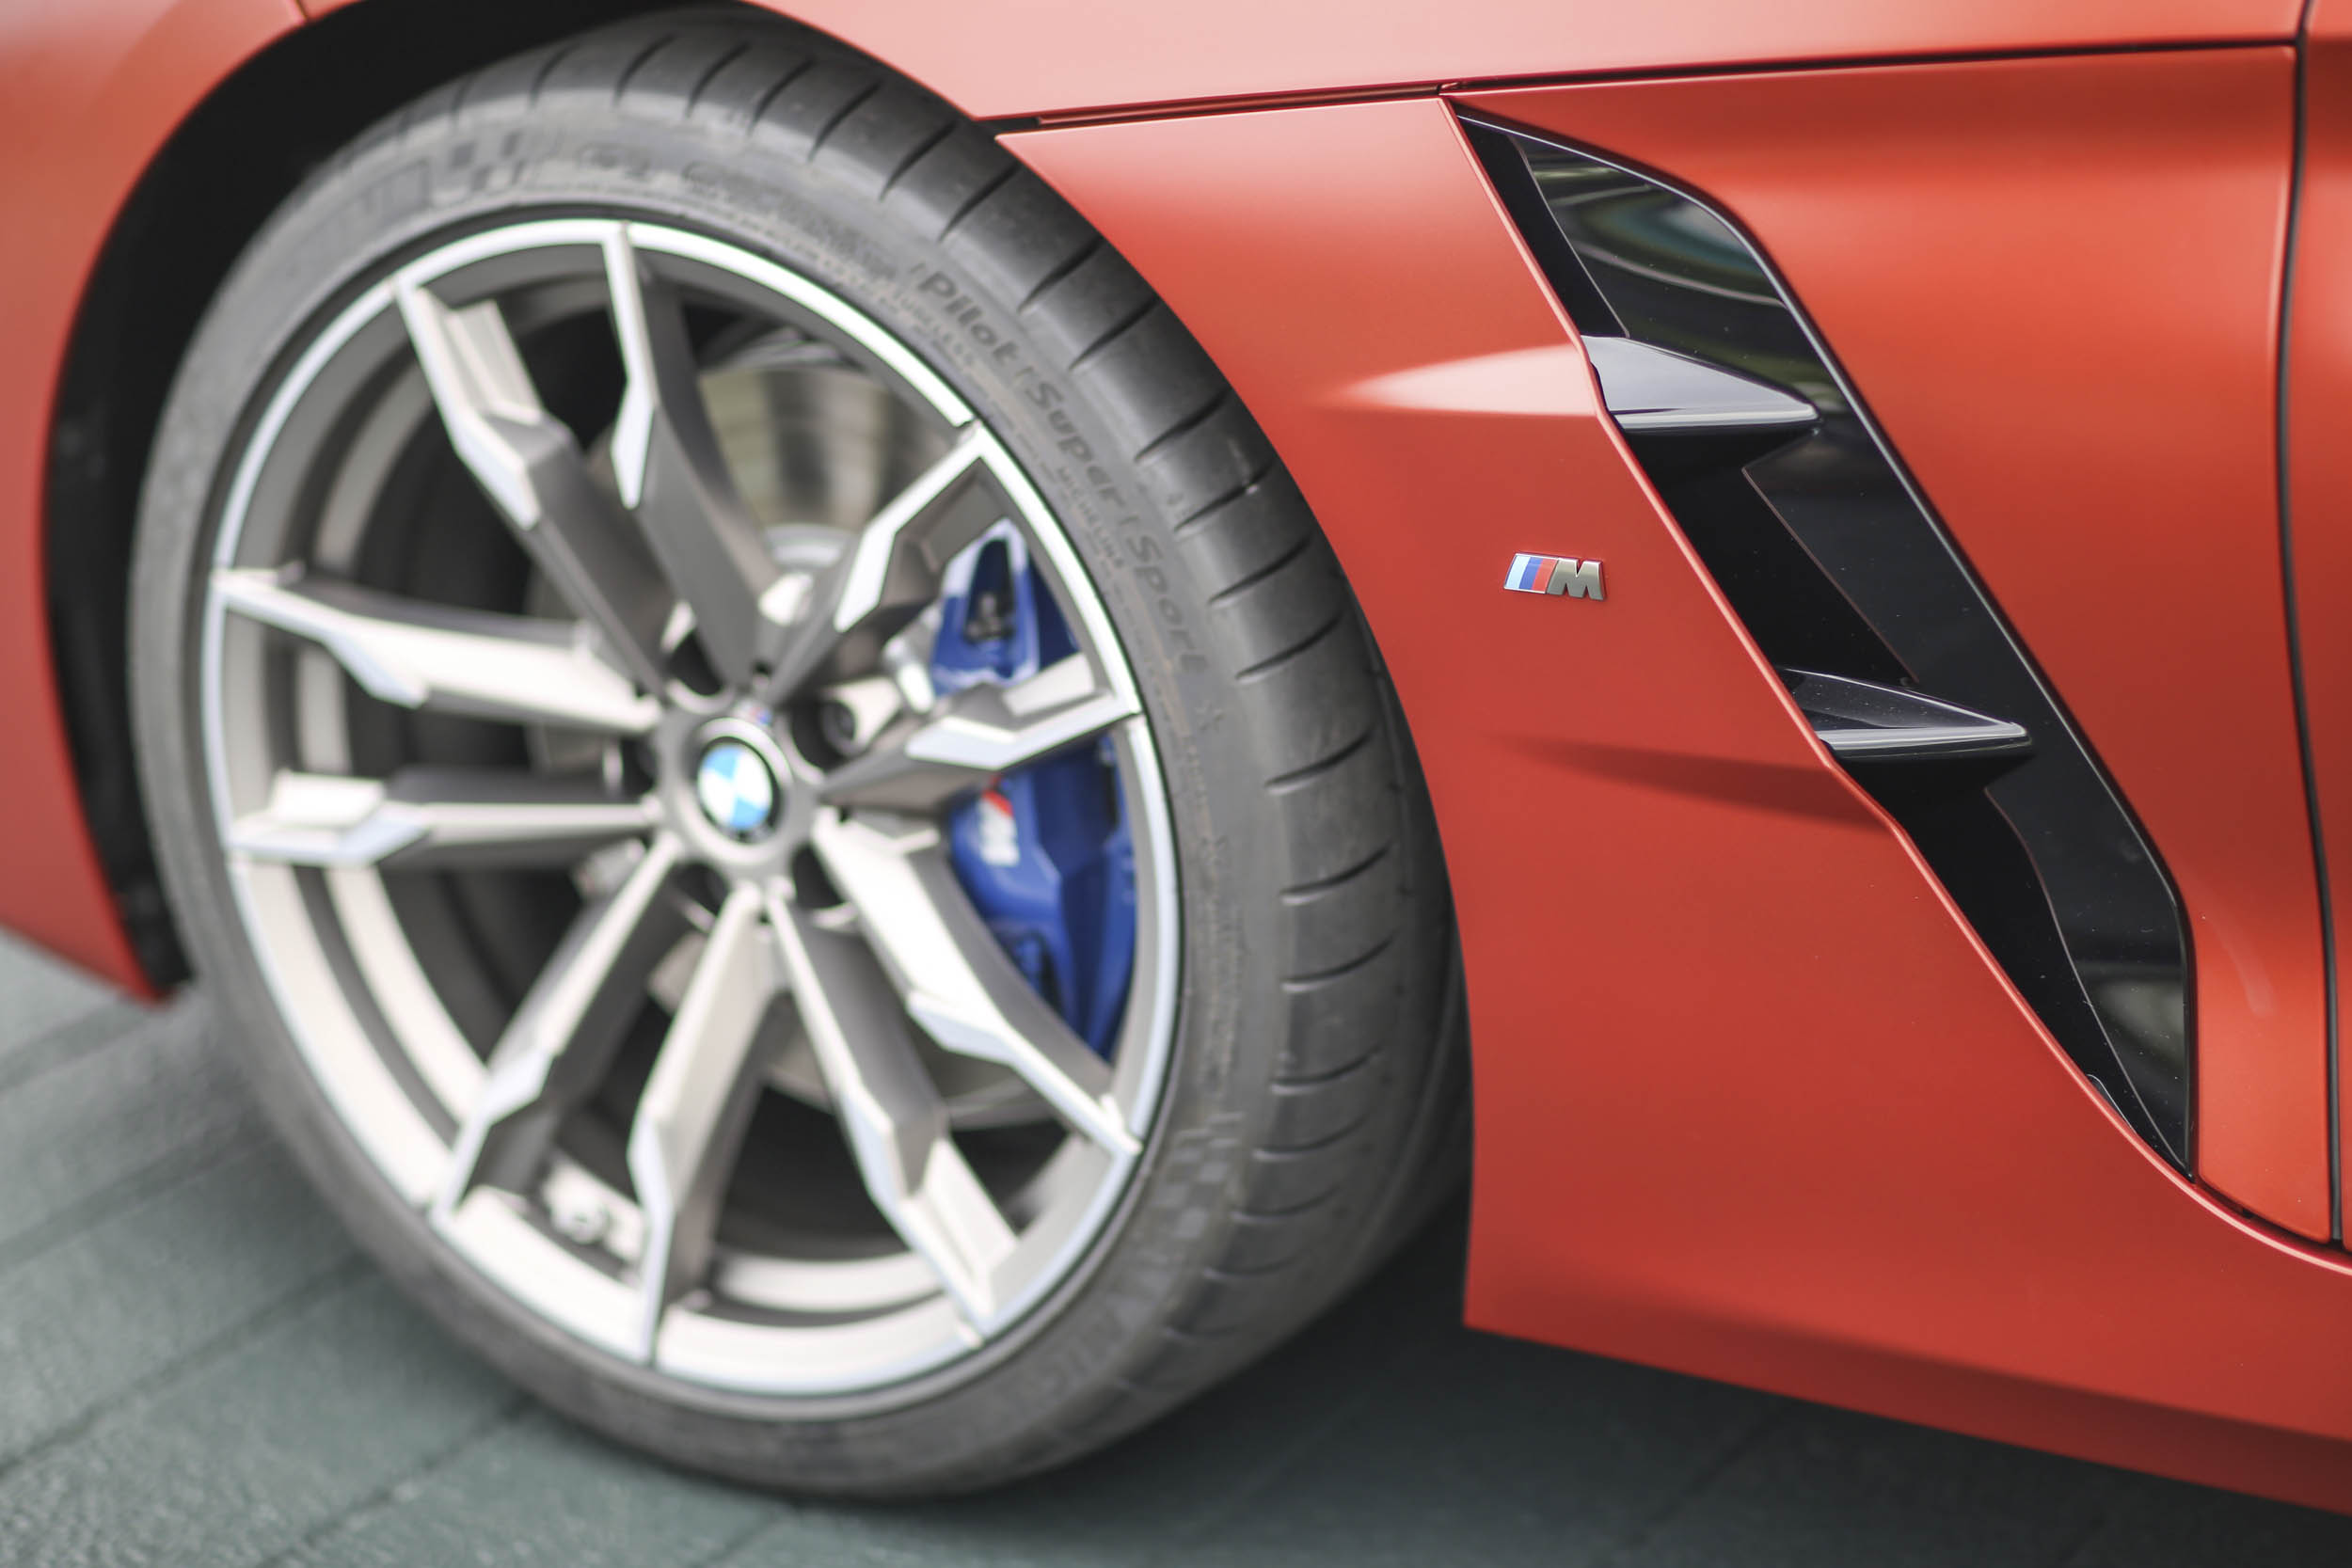 BMW Z4 M40i roadster detail